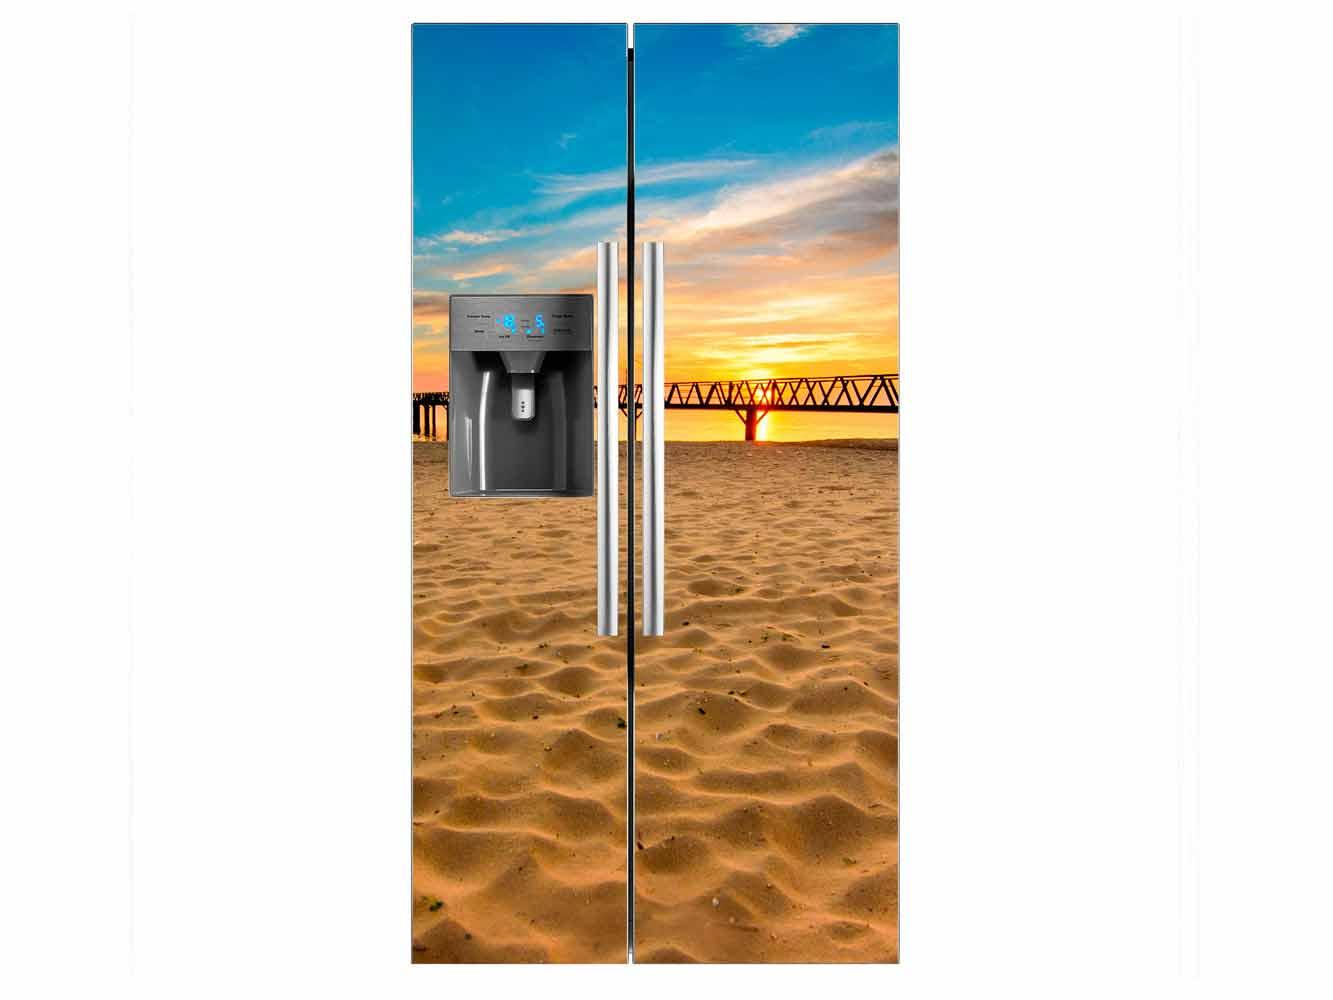 Vinilo Frigorífico Playa Muelle | Carteles XXL - Impresión carteleria publicitaria